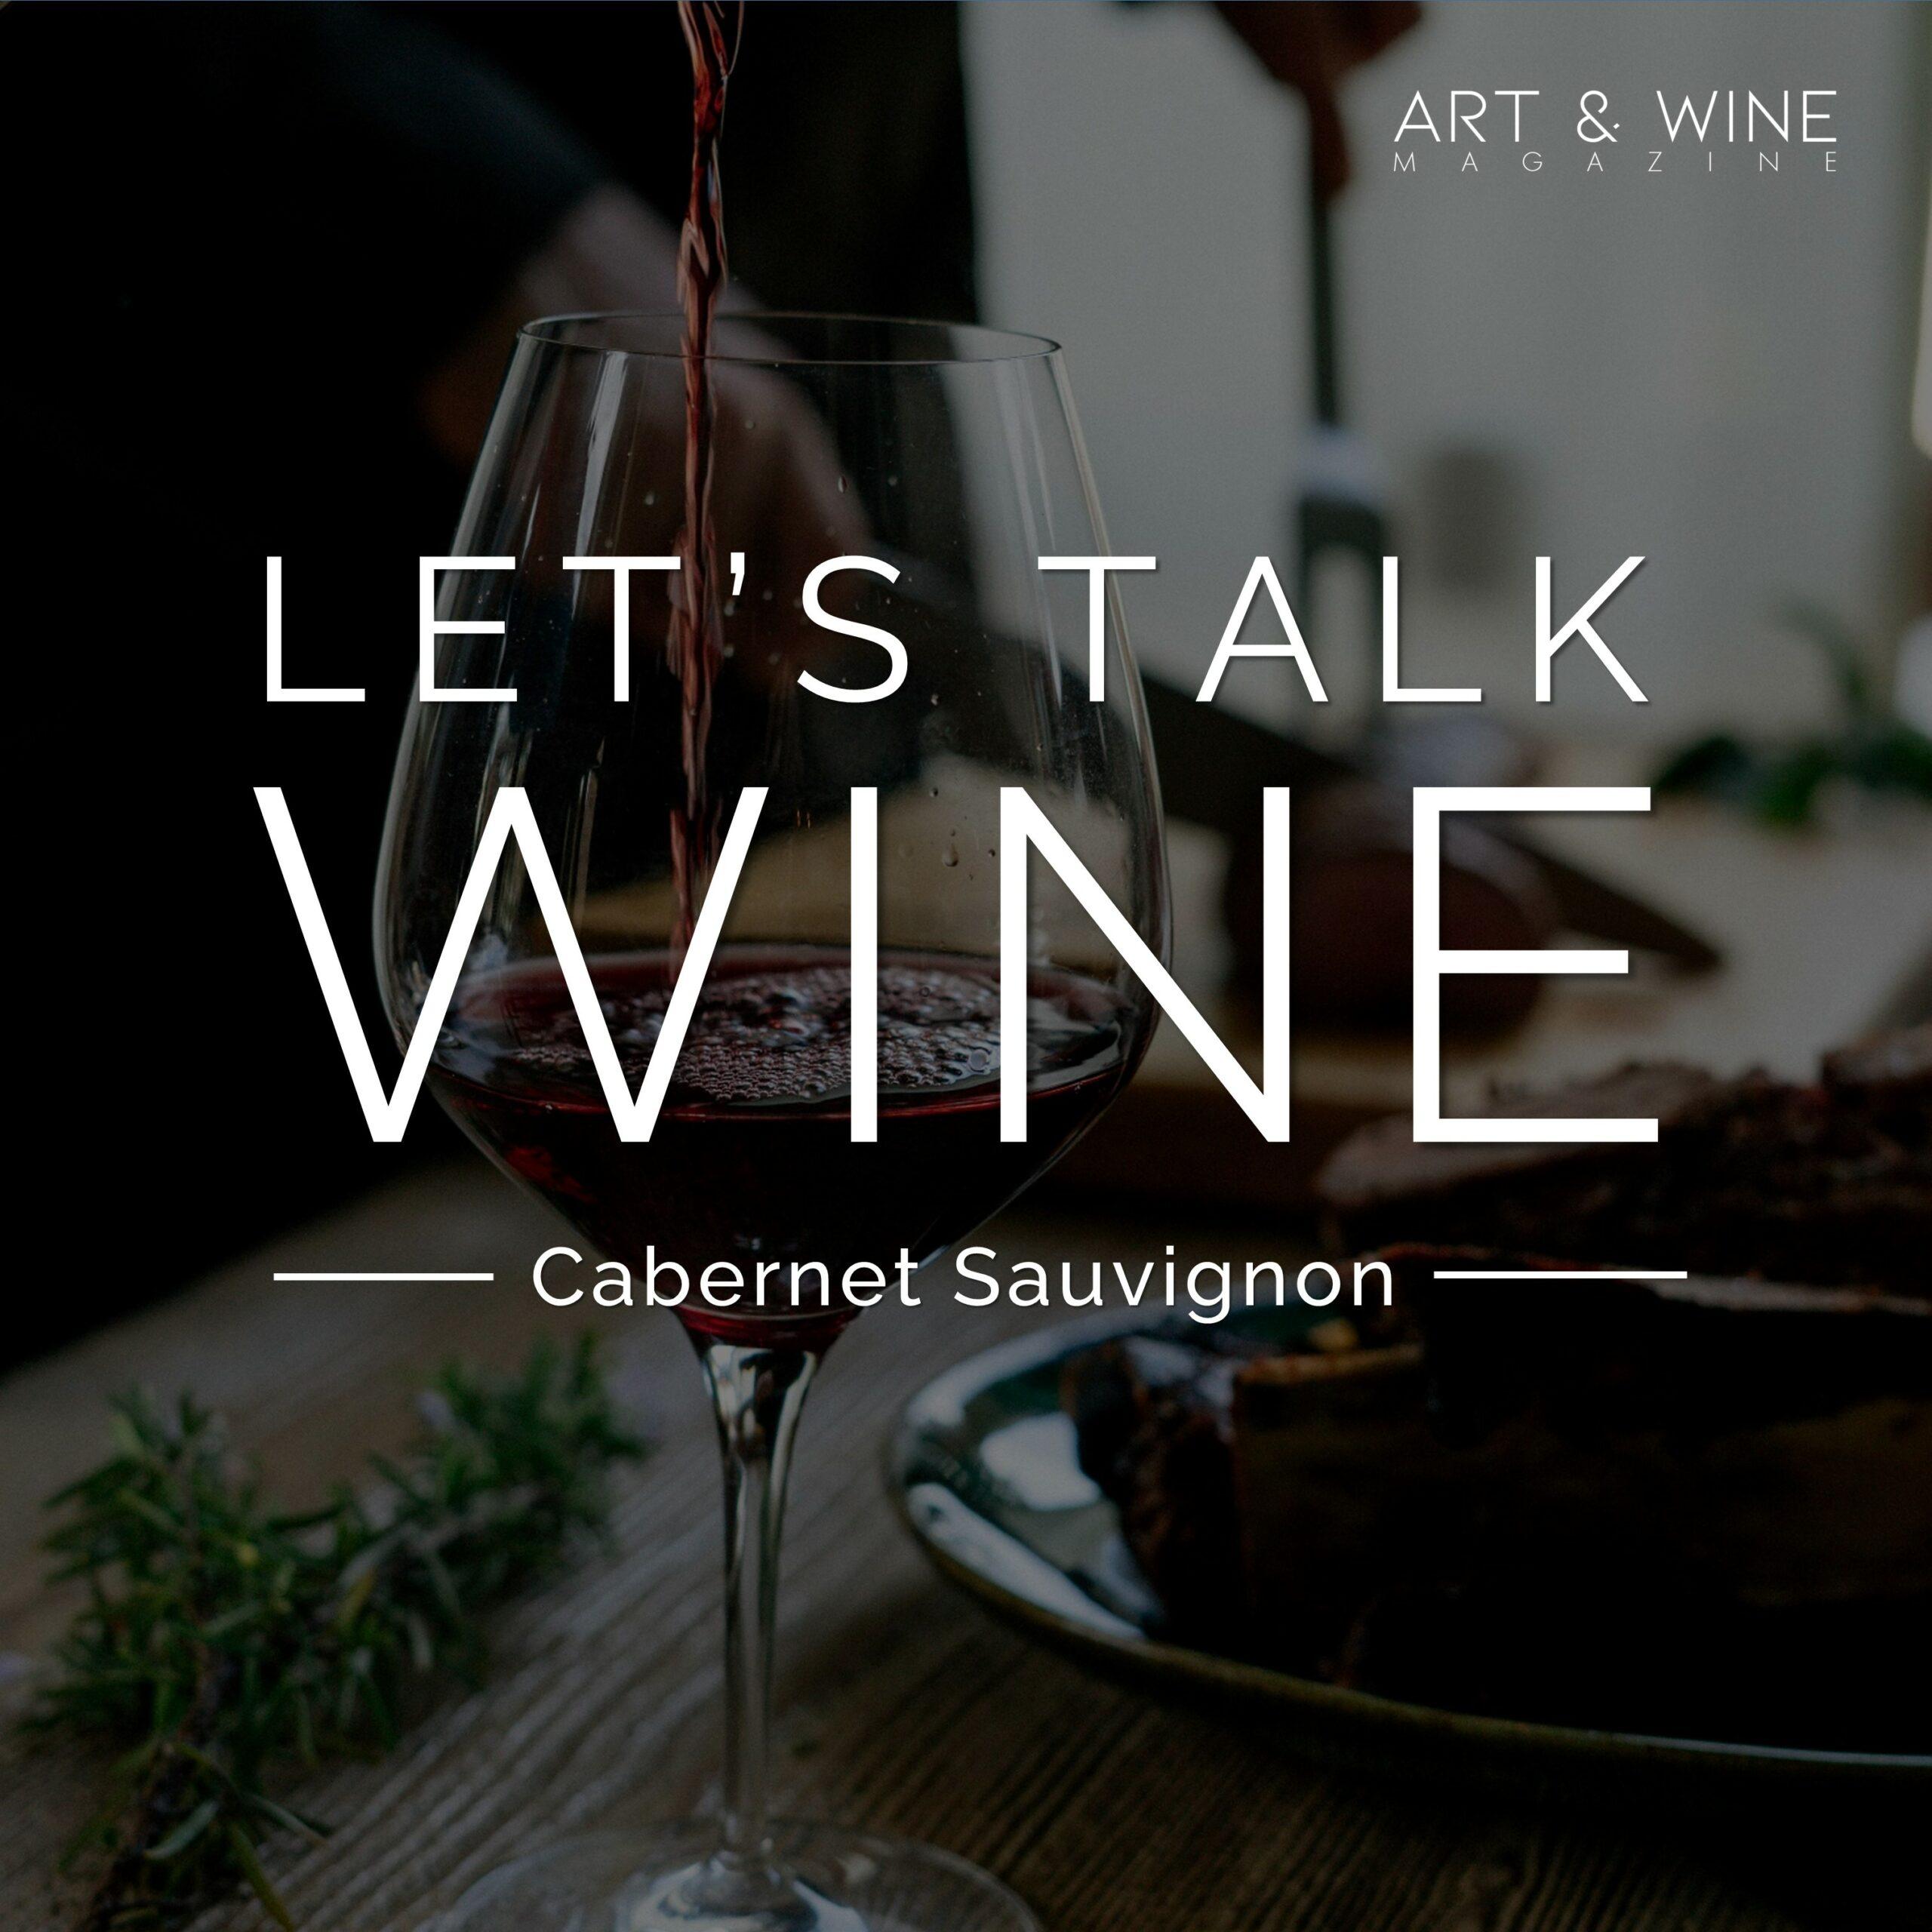 Let's talk wine christian Peth Wetz Podcast Cabernet Sauvignon